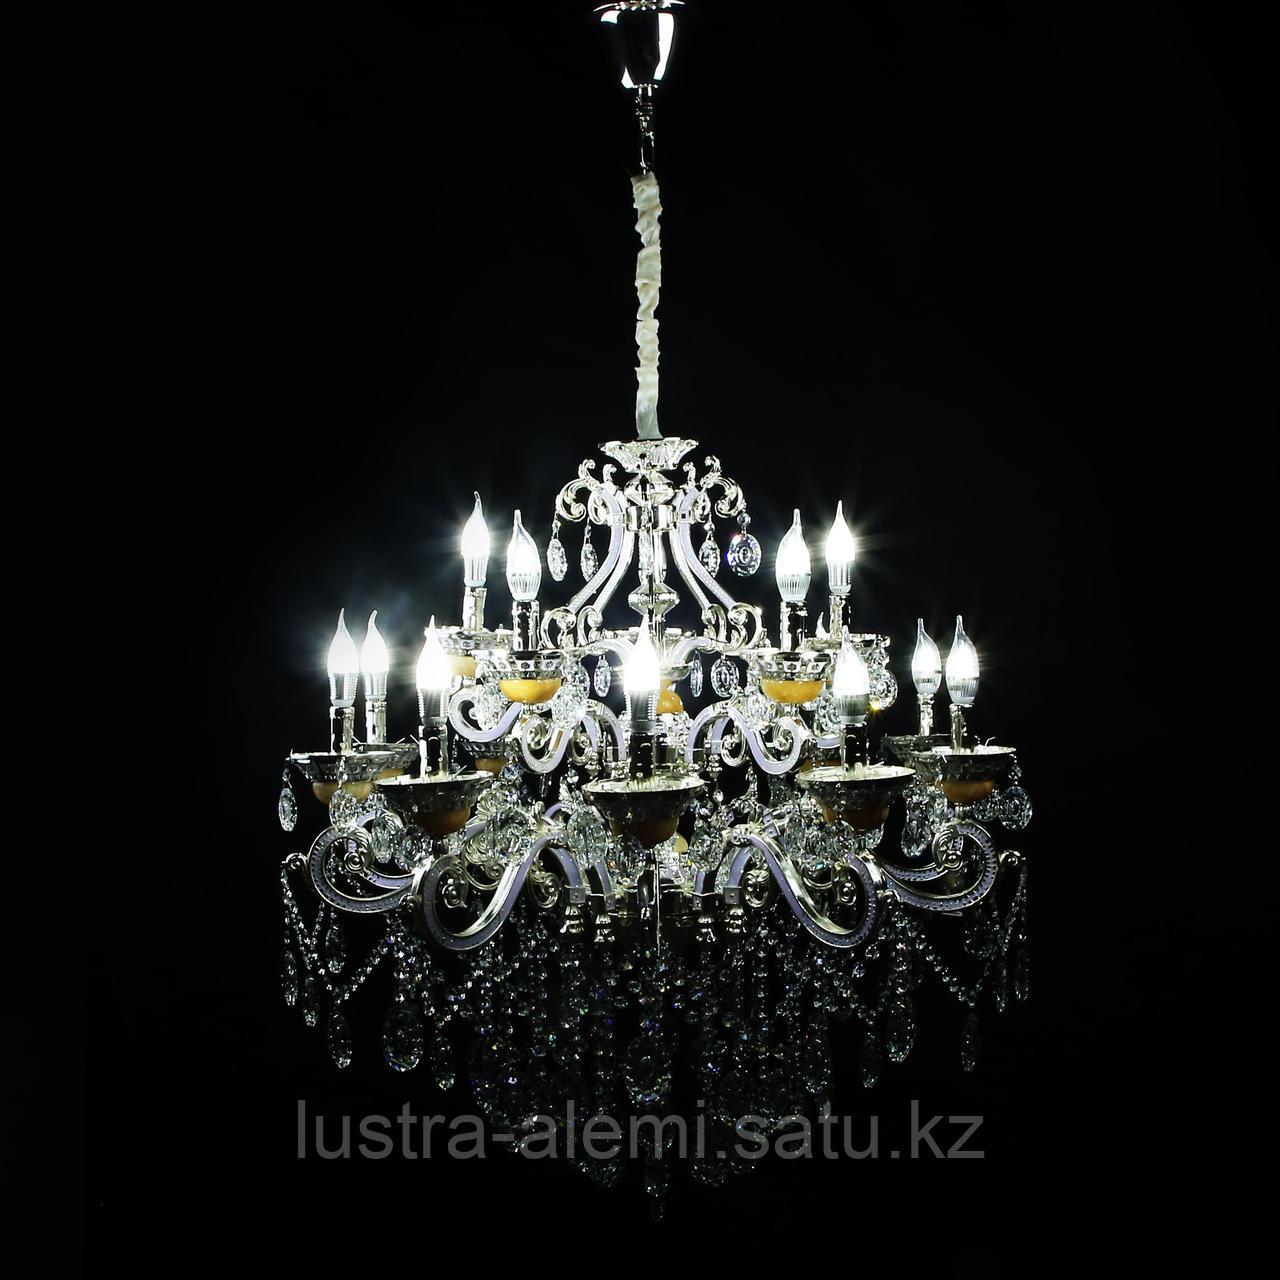 Люстра Классика 8825/10+5 Silver